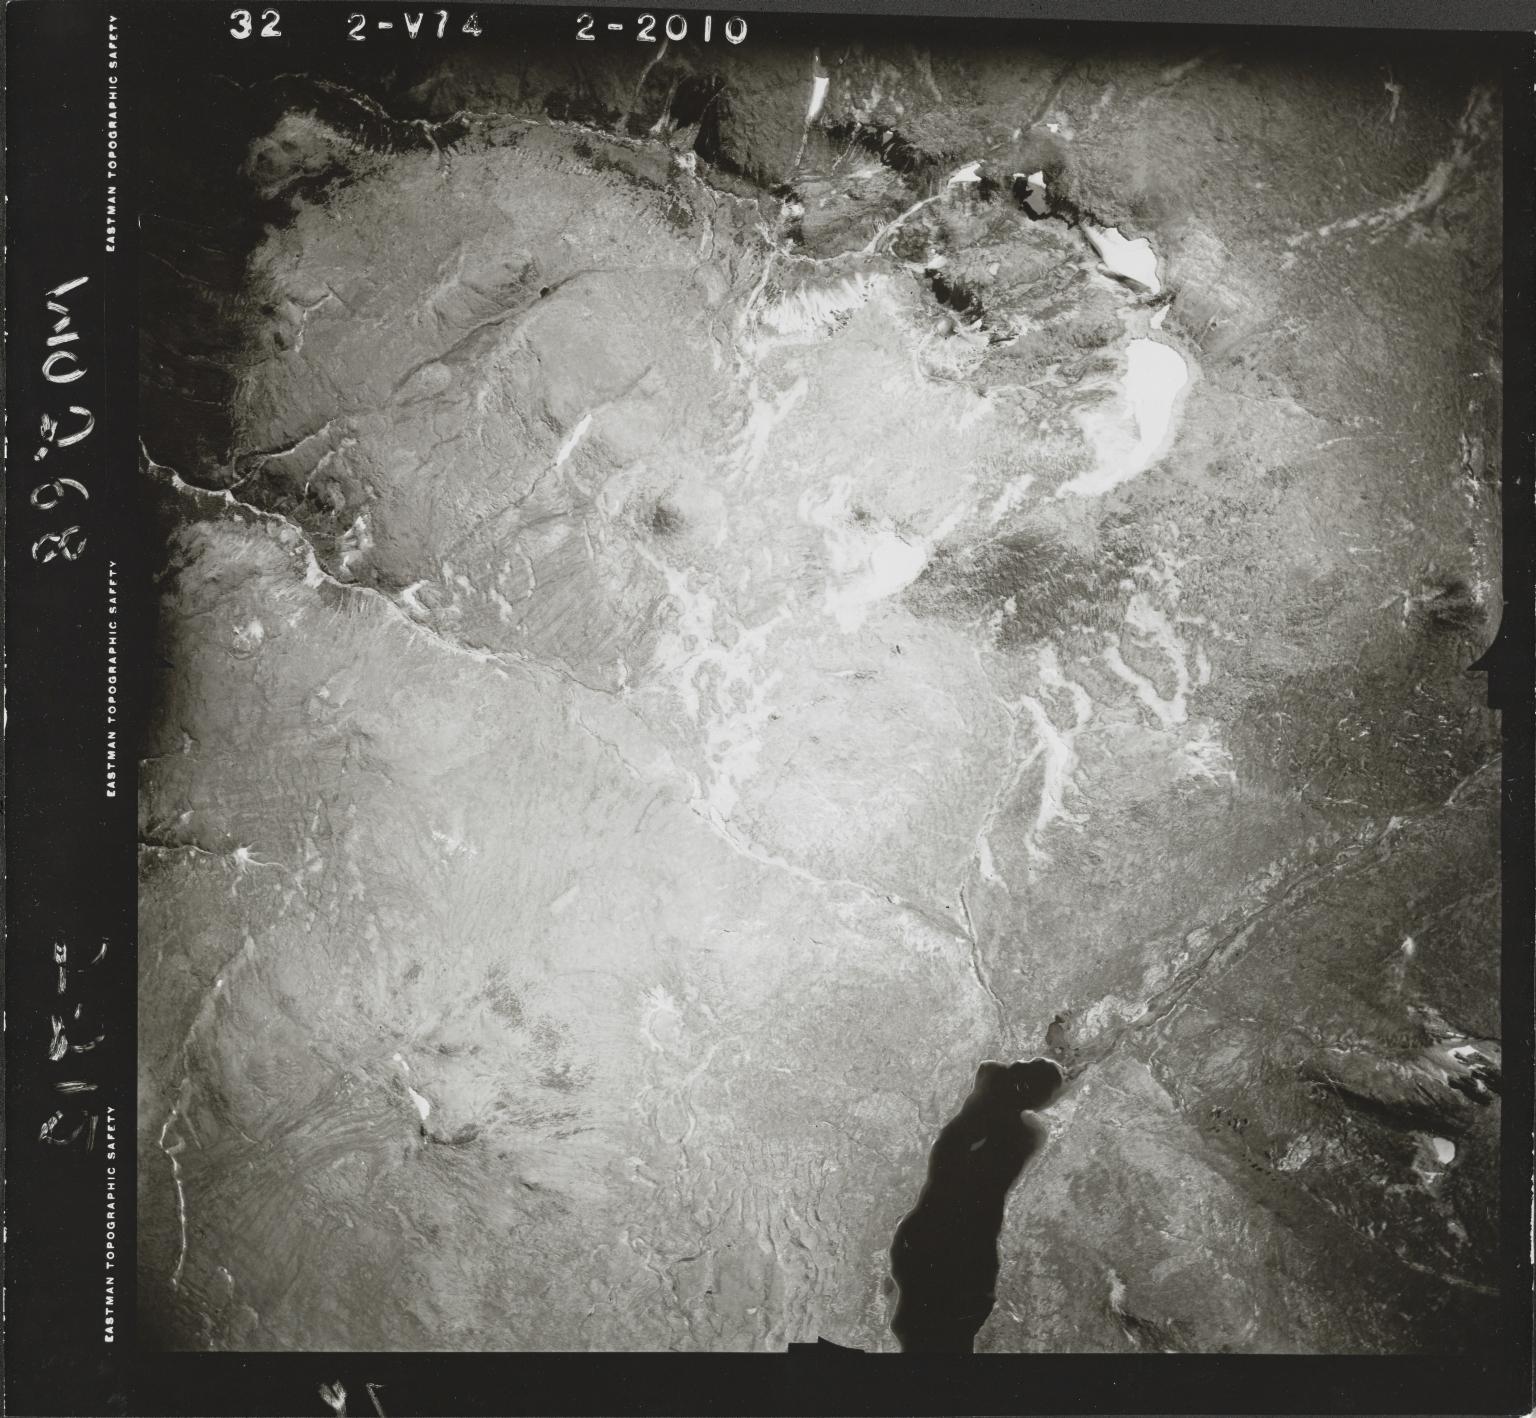 Gladys Lake, aerial photograph FL 47 V-74, British Columbia